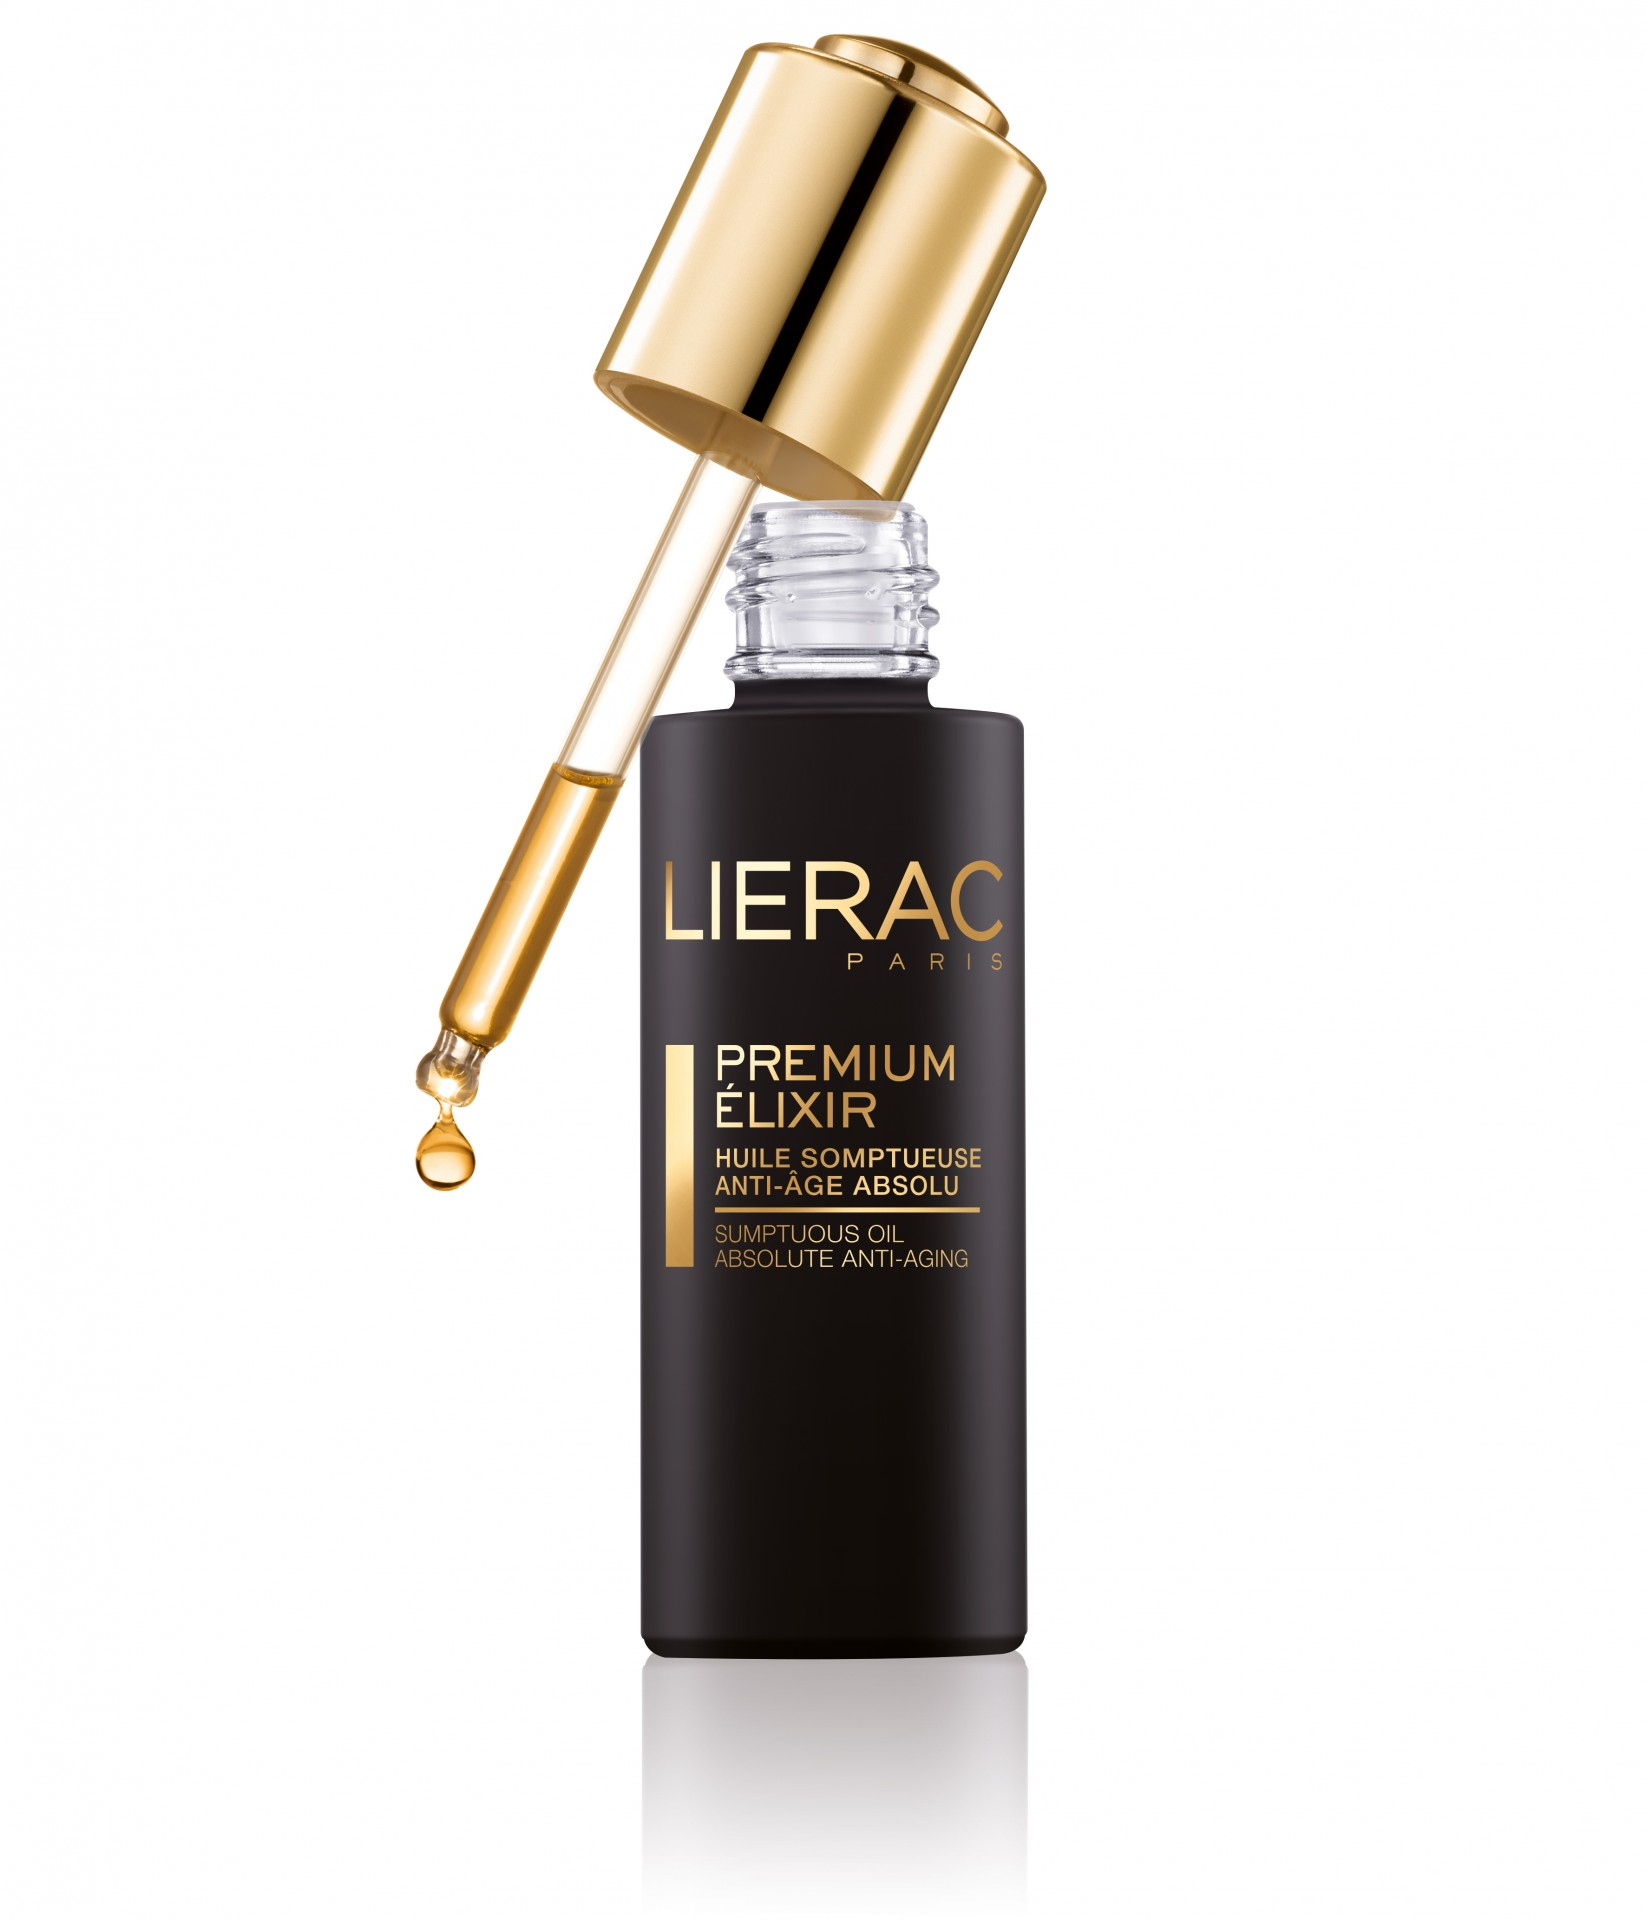 Lierac - Premium Elixir 30ml